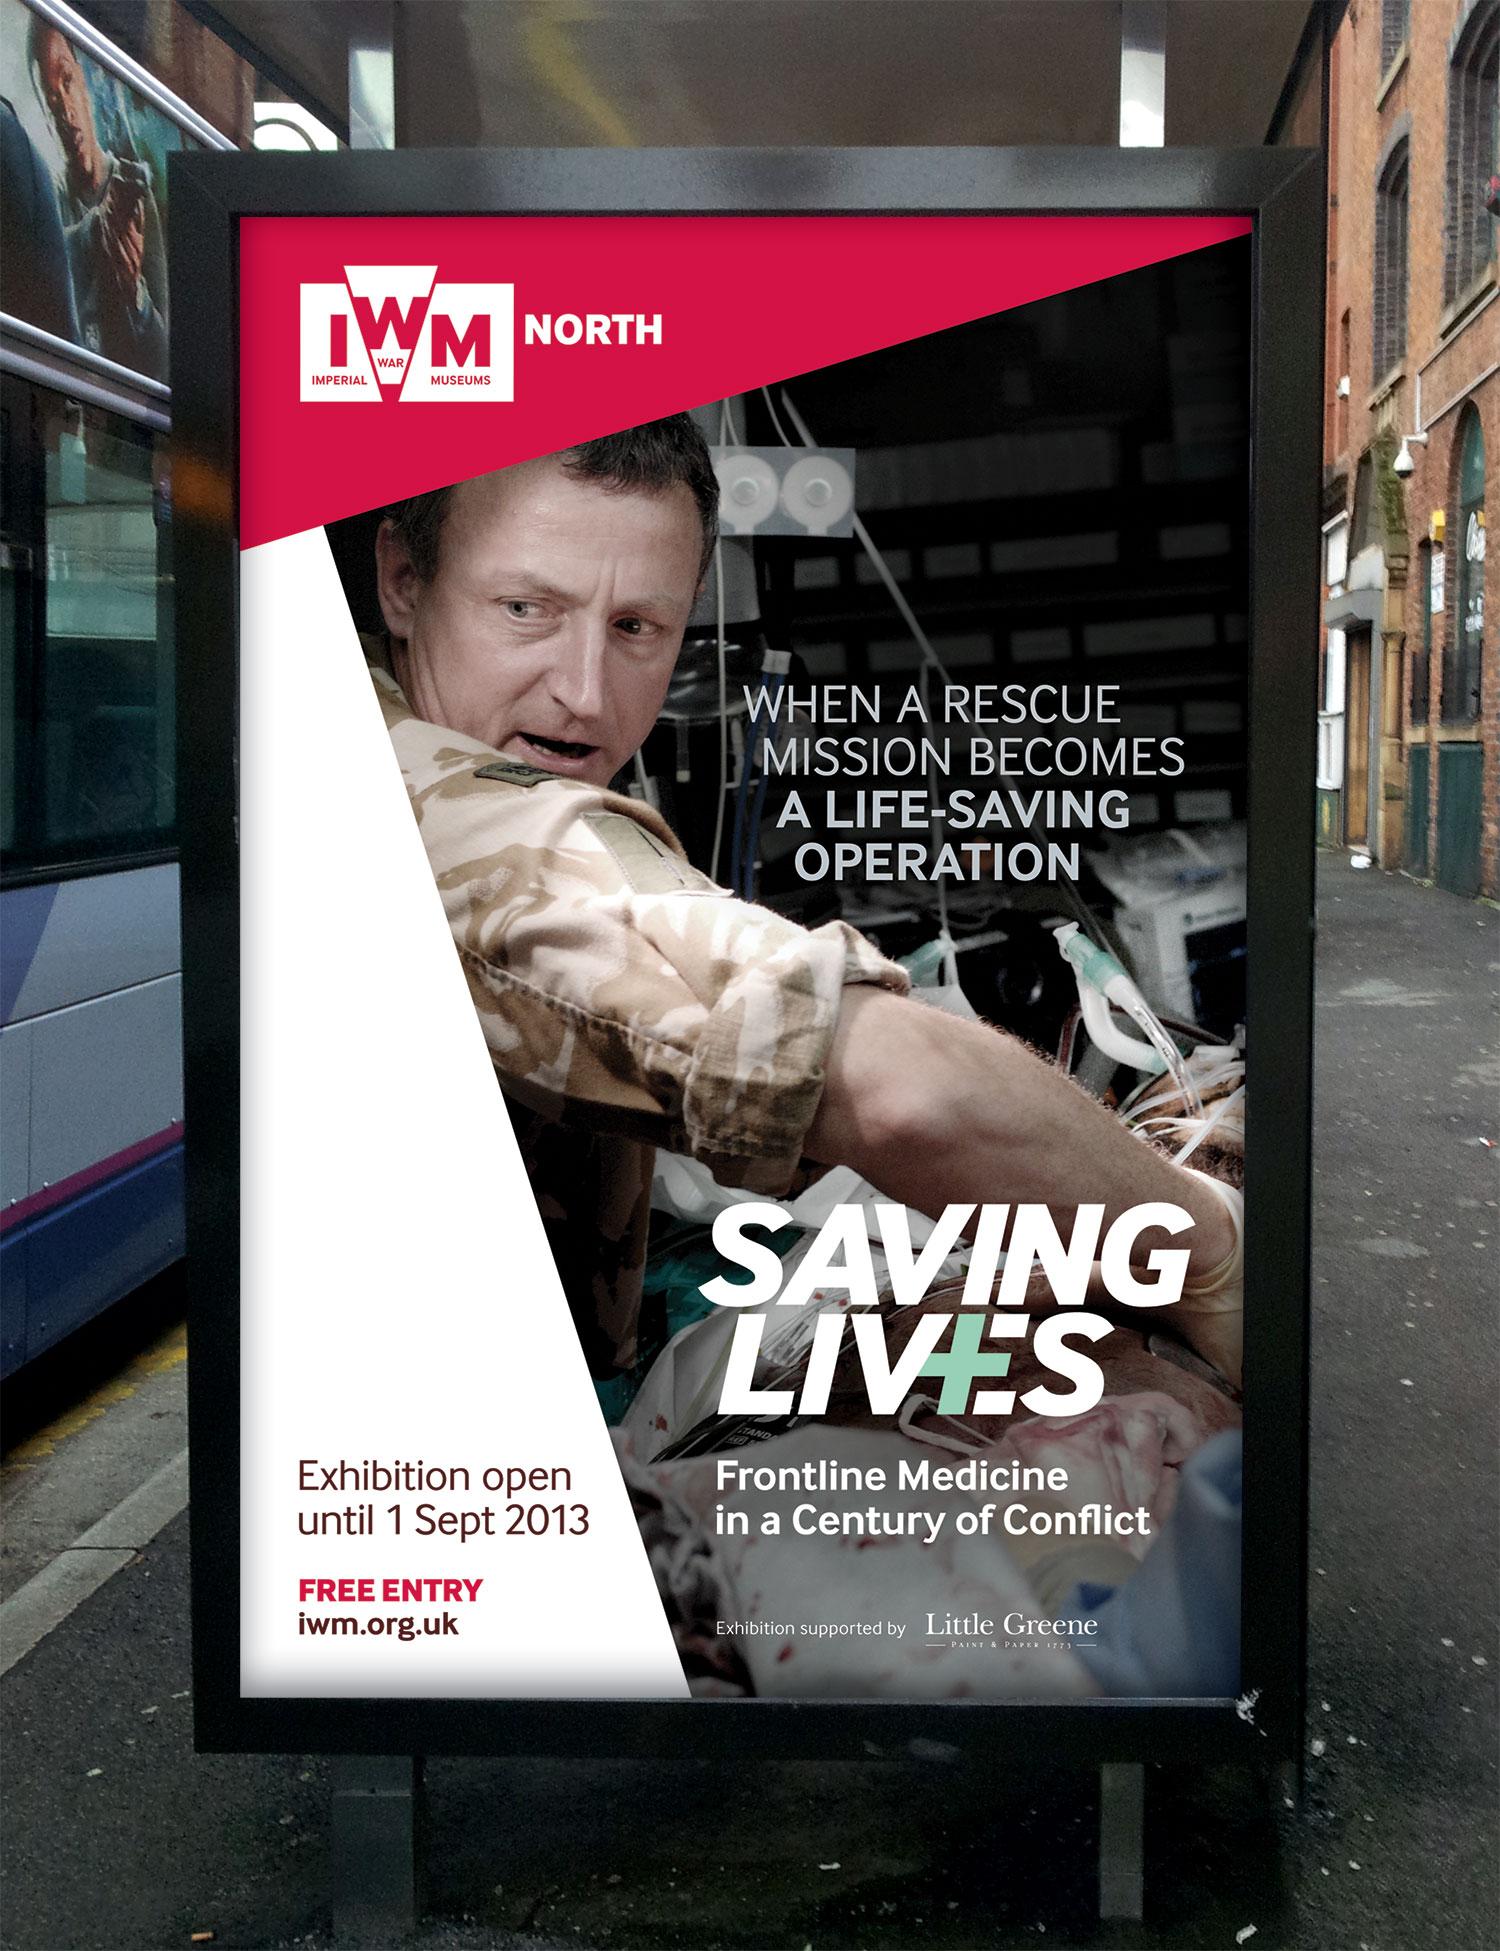 iwm_saving_lives_poster_bus.jpg